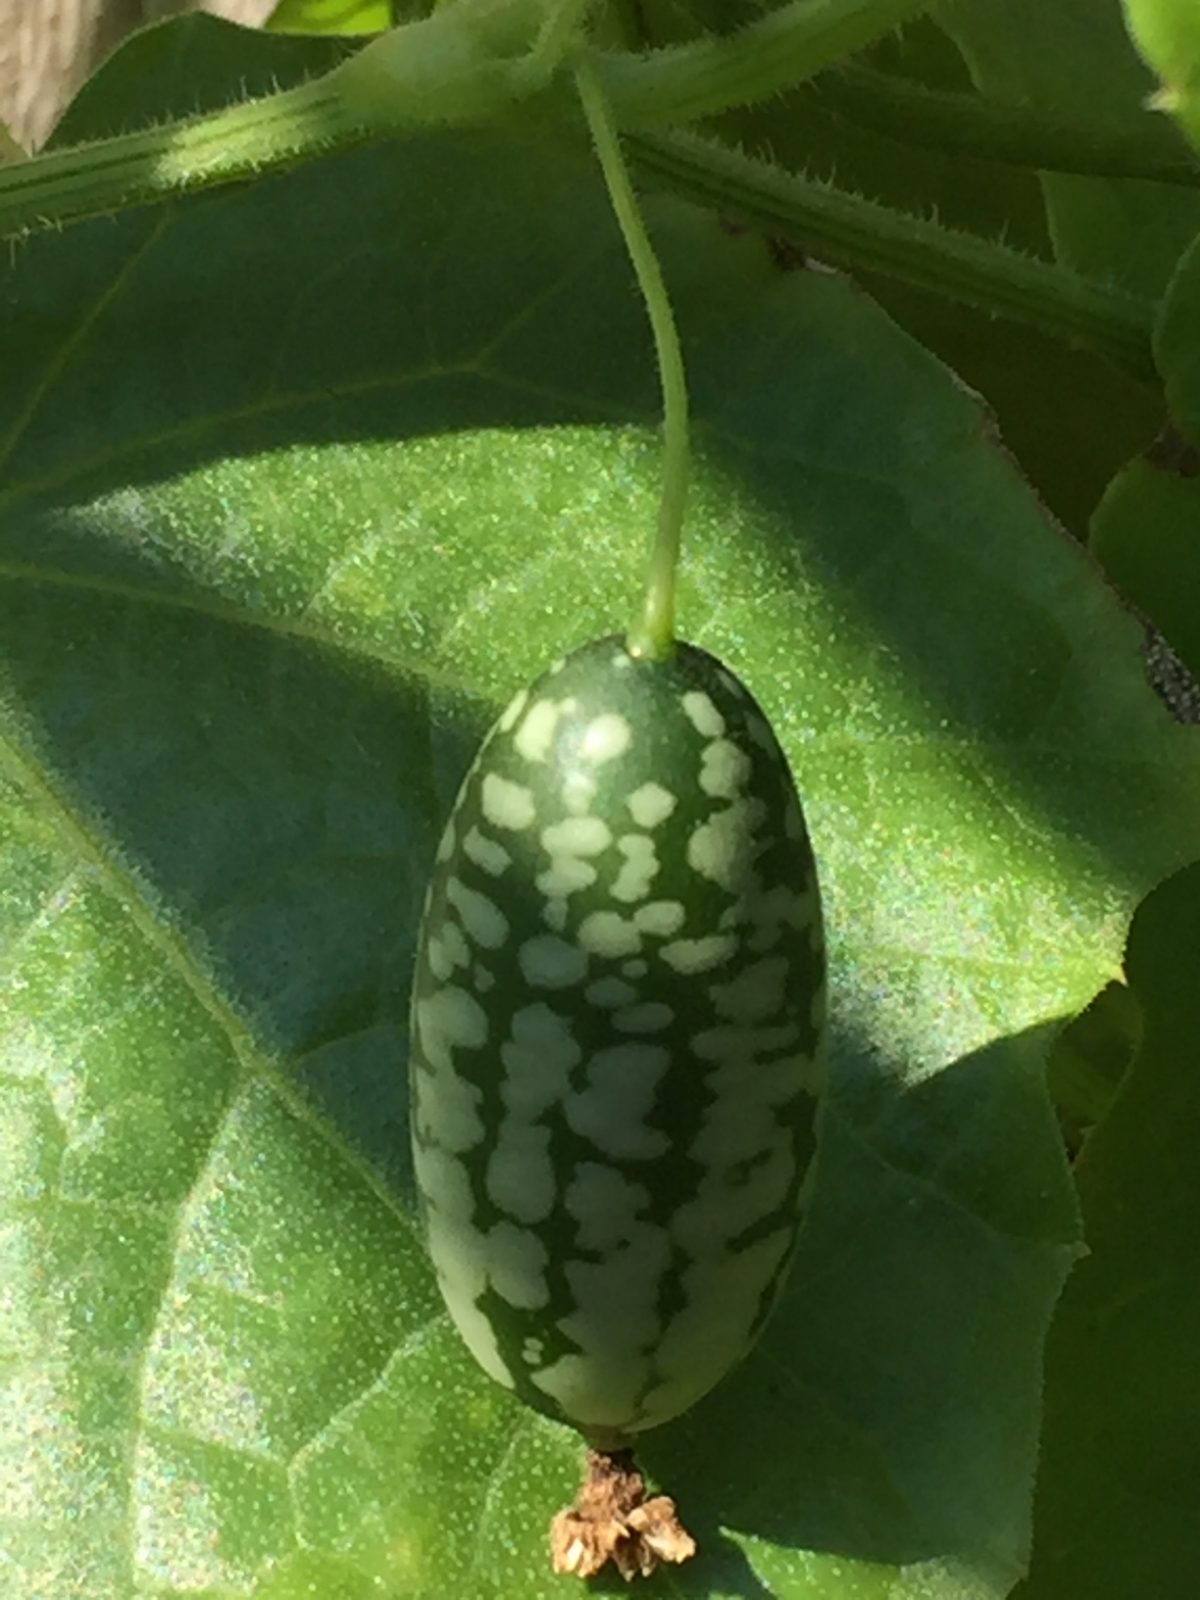 Imagine a cucumber that looks like a grape-sized watermelon